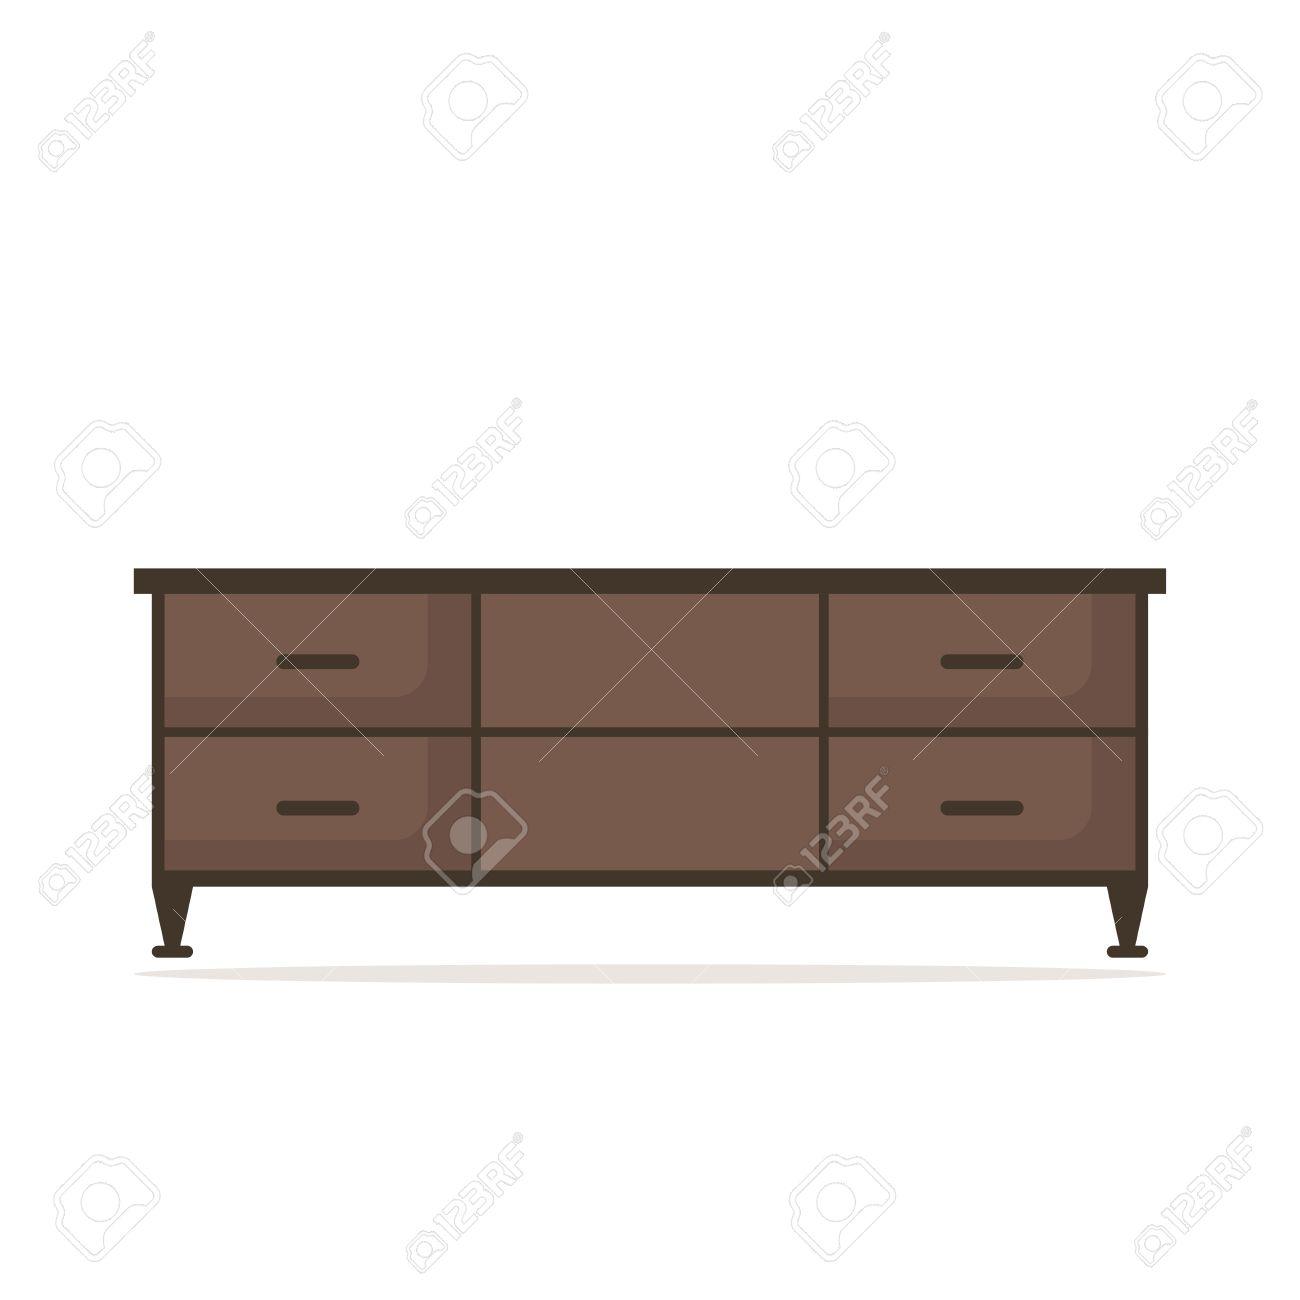 Aislado Mesa De TV Icono Sobre Fondo Blanco. Muebles Modernos Para ...